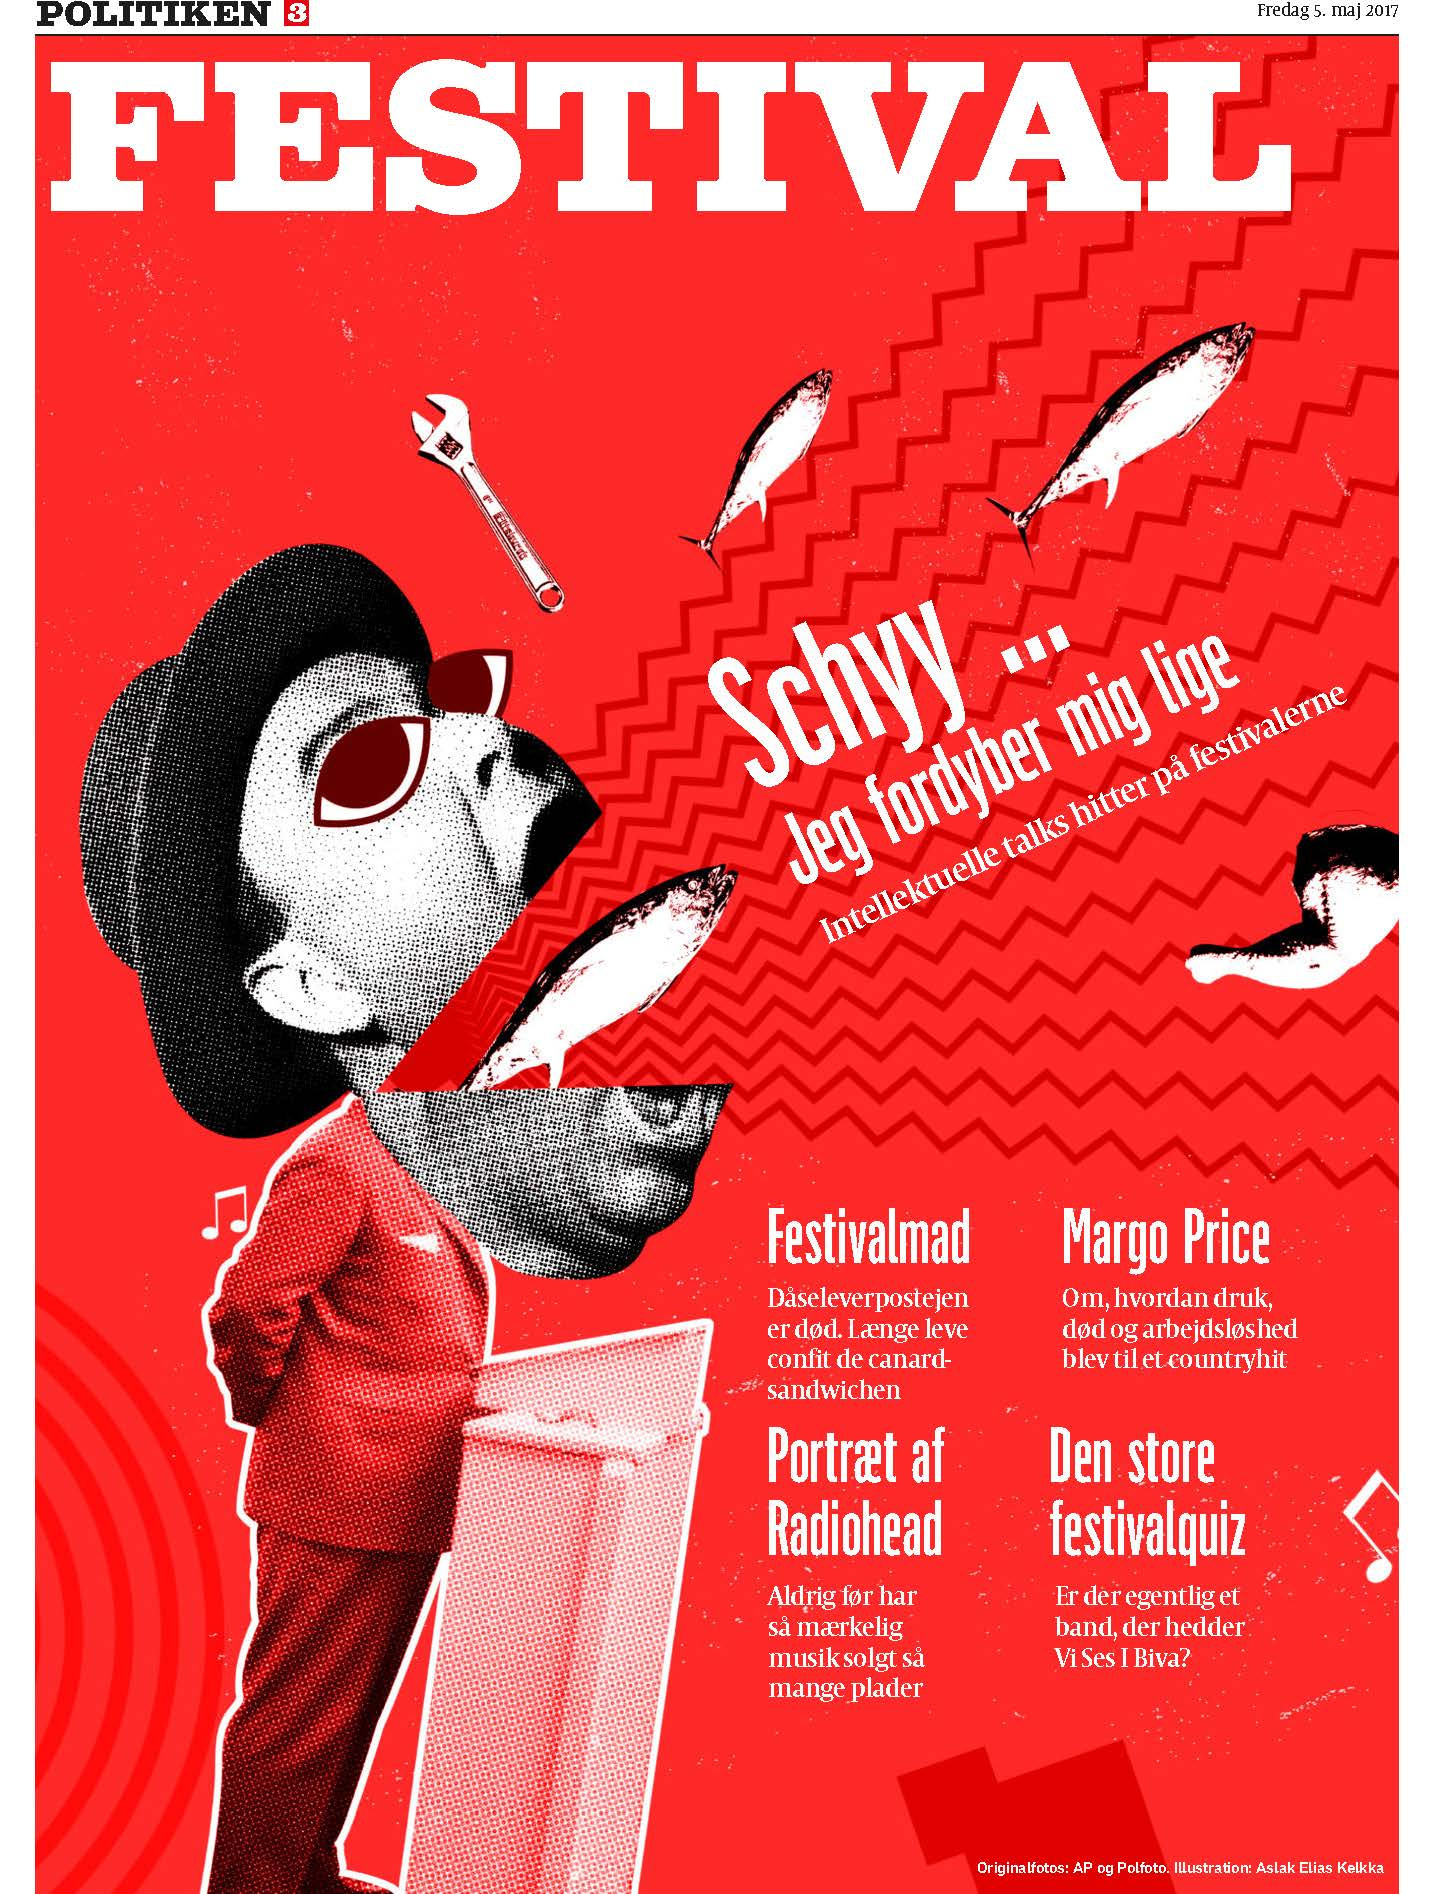 Festival tema i Ibyen fredag 3. maj 2019